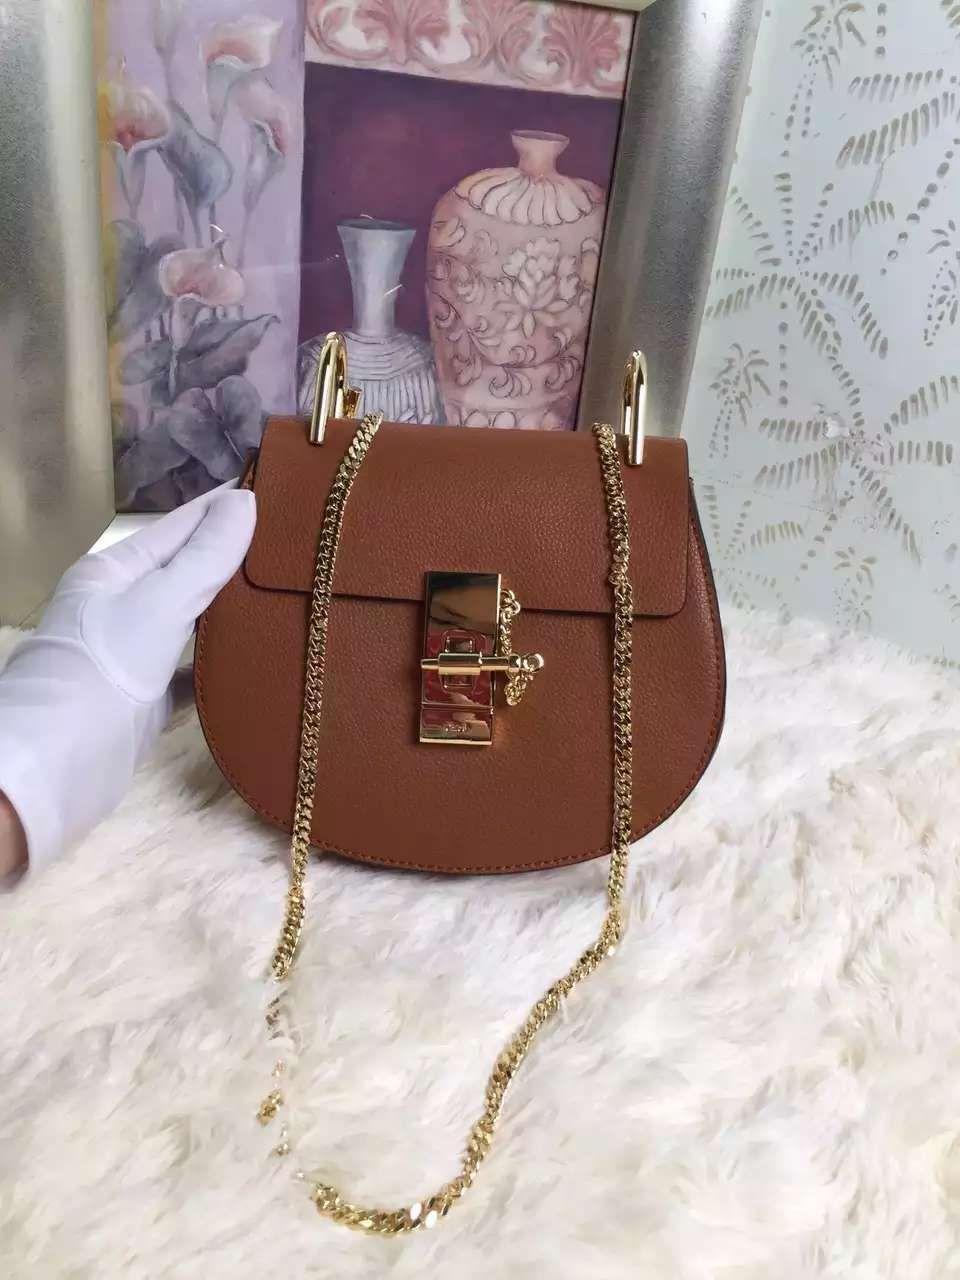 chloé Bag, ID : 49758(FORSALE:a@yybags.com), chloe see, chloe clutch sale, chloe clutch handbags, chloe